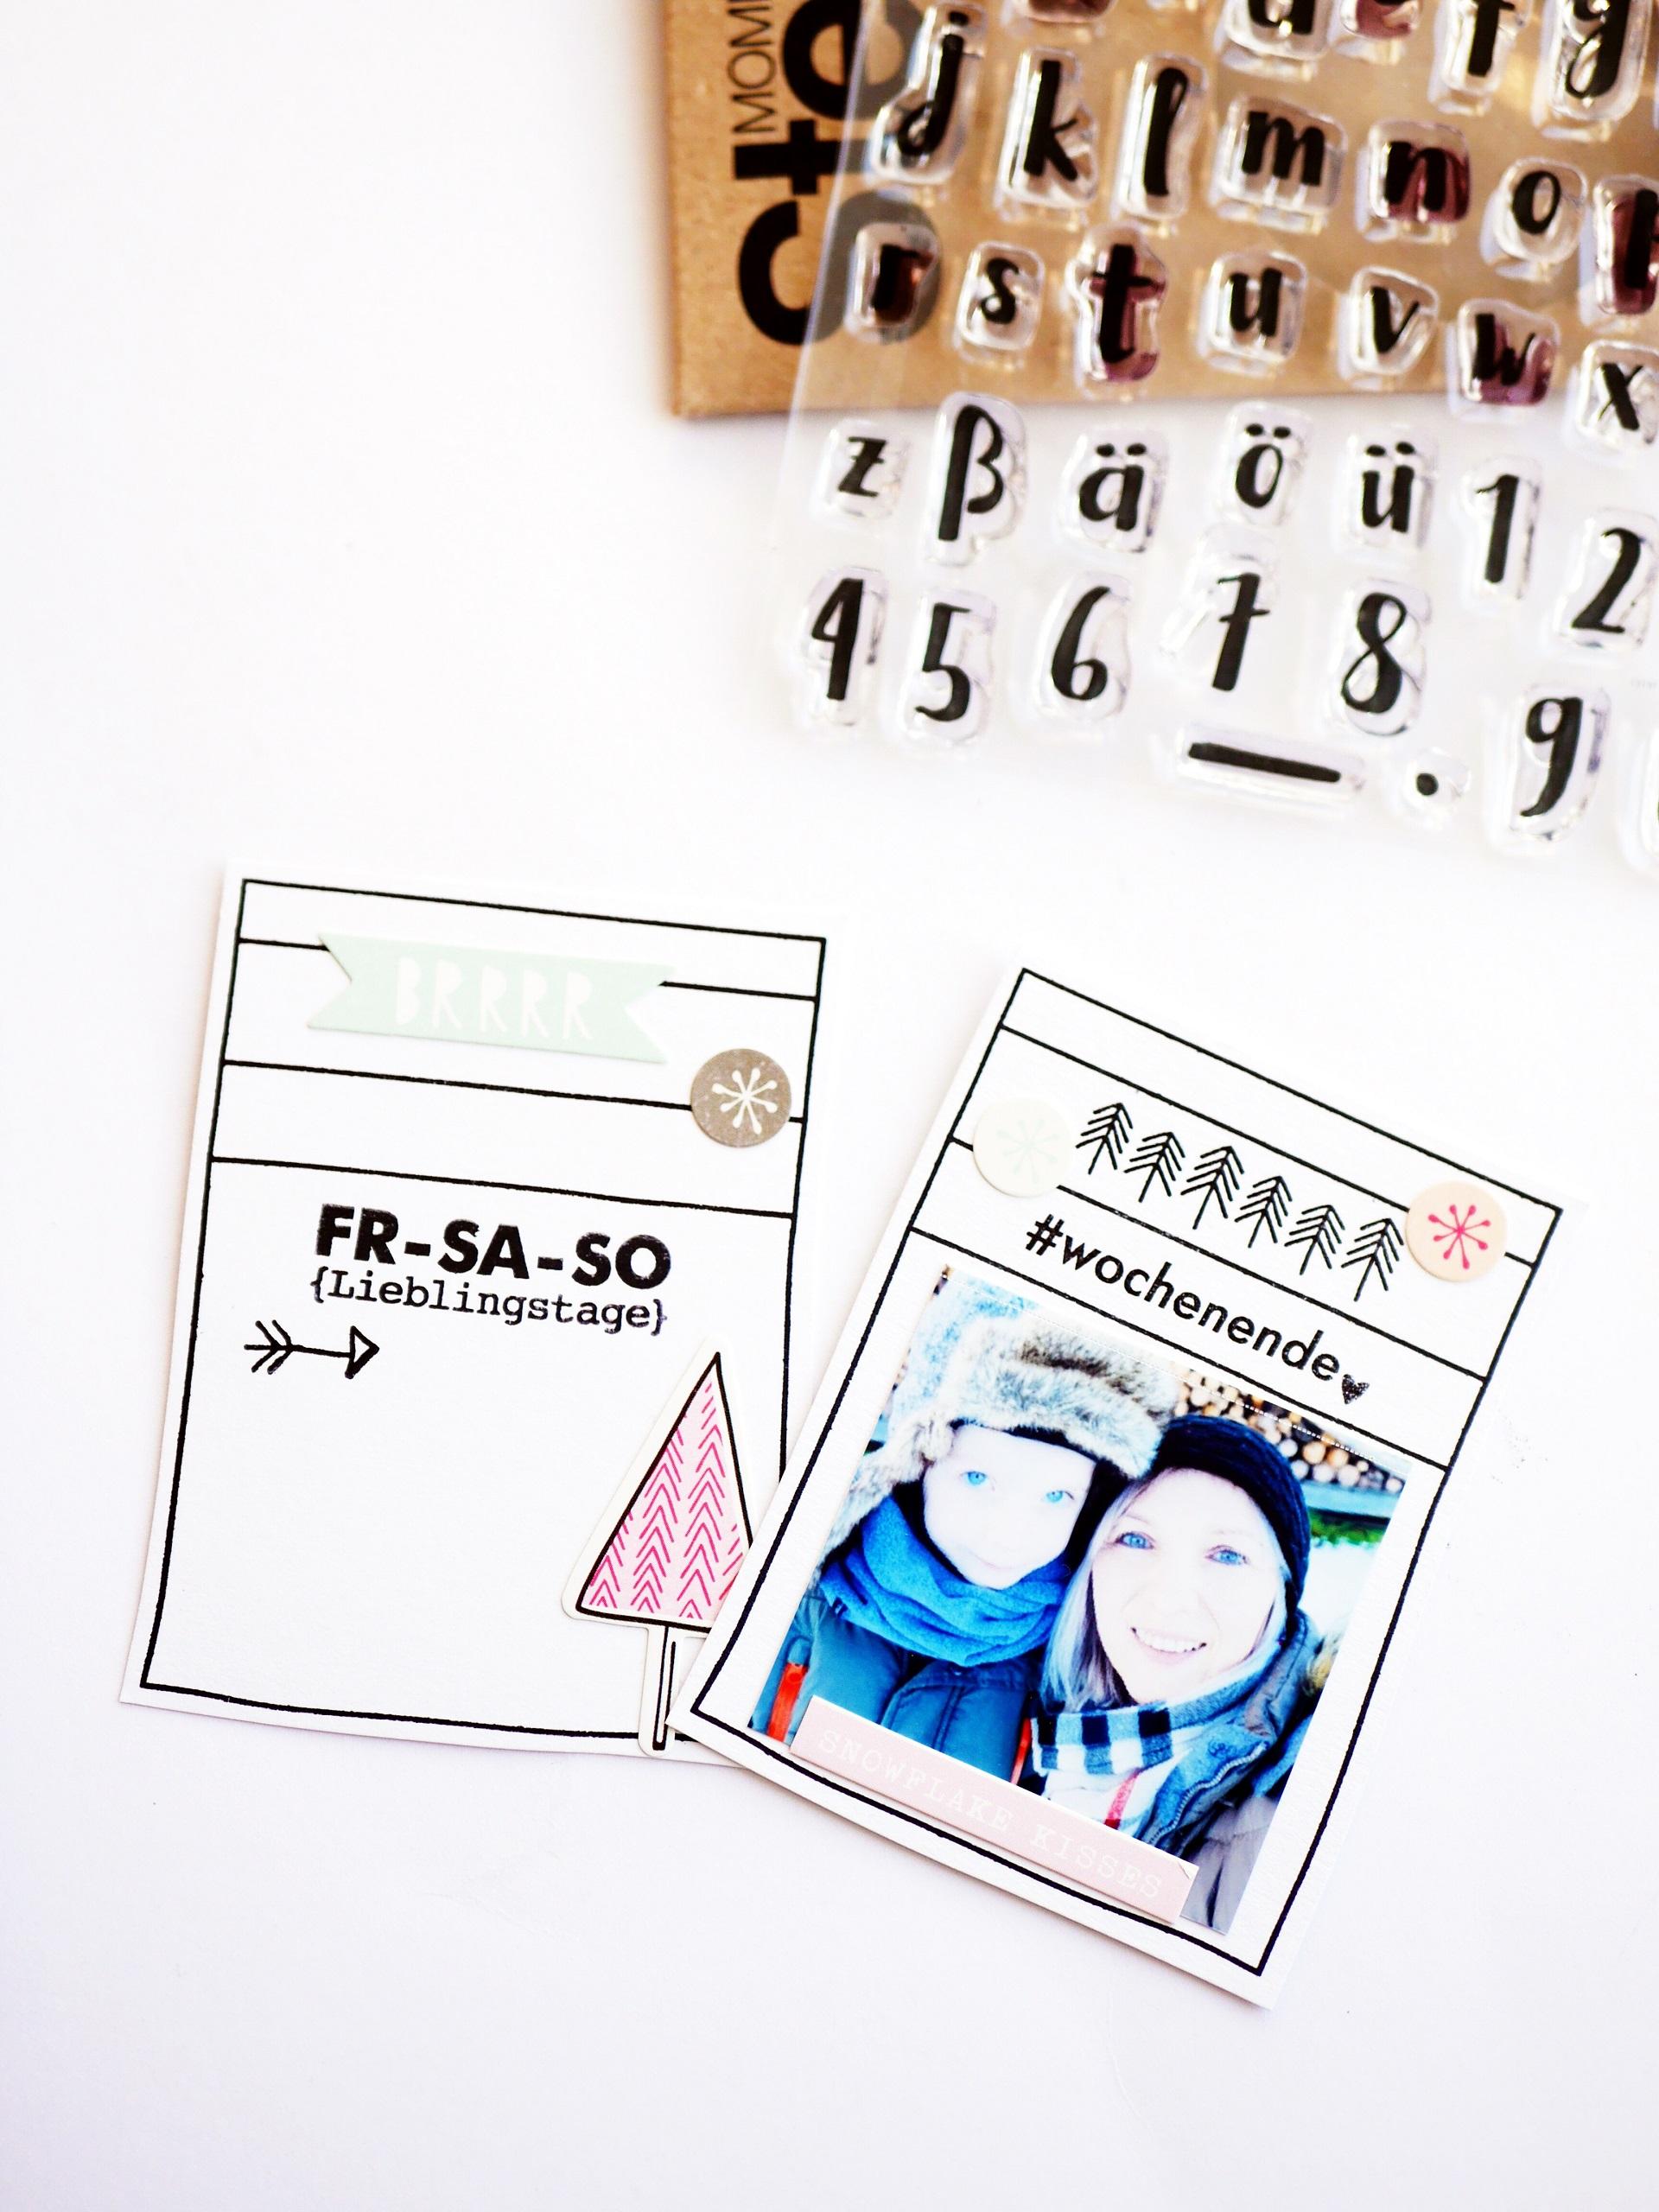 papierprojekt_Sonja_Minialbum_Journaling Karten_11